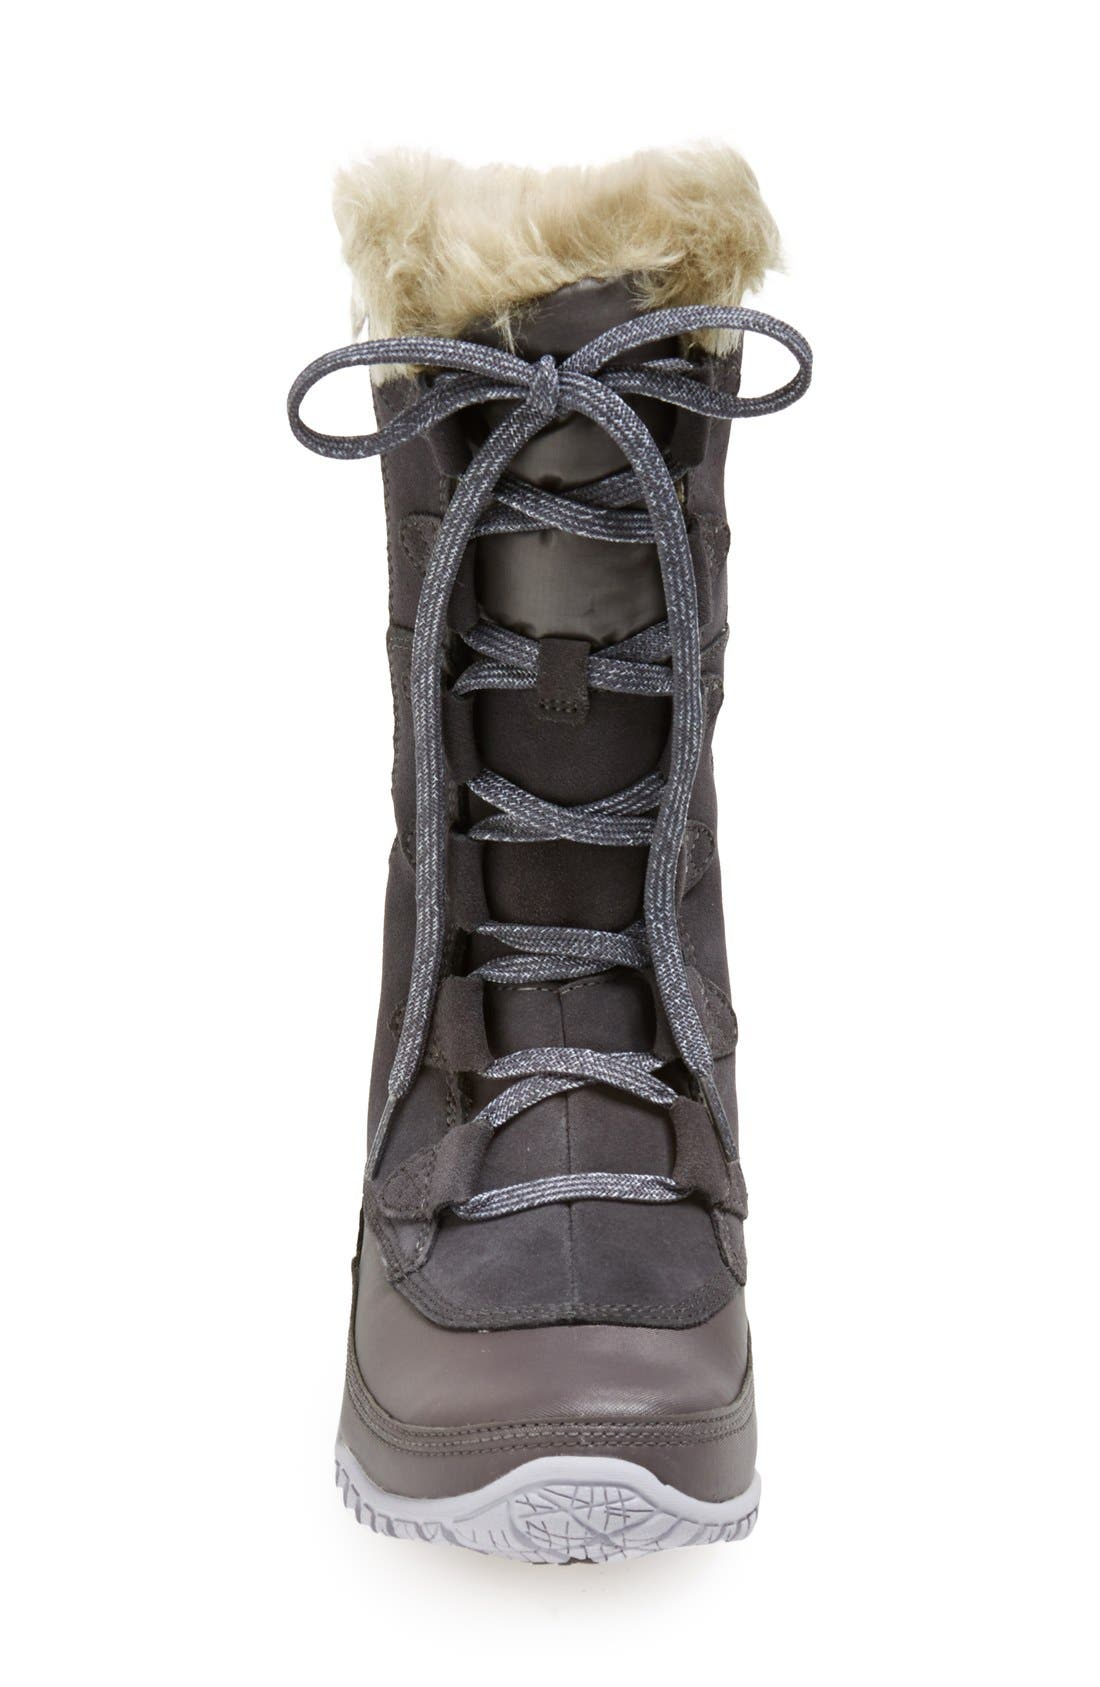 Alternate Image 3  - The North Face 'Nuptse Purna' Waterproof PrimaLoft® Eco Insulated Winter Boot (Women)